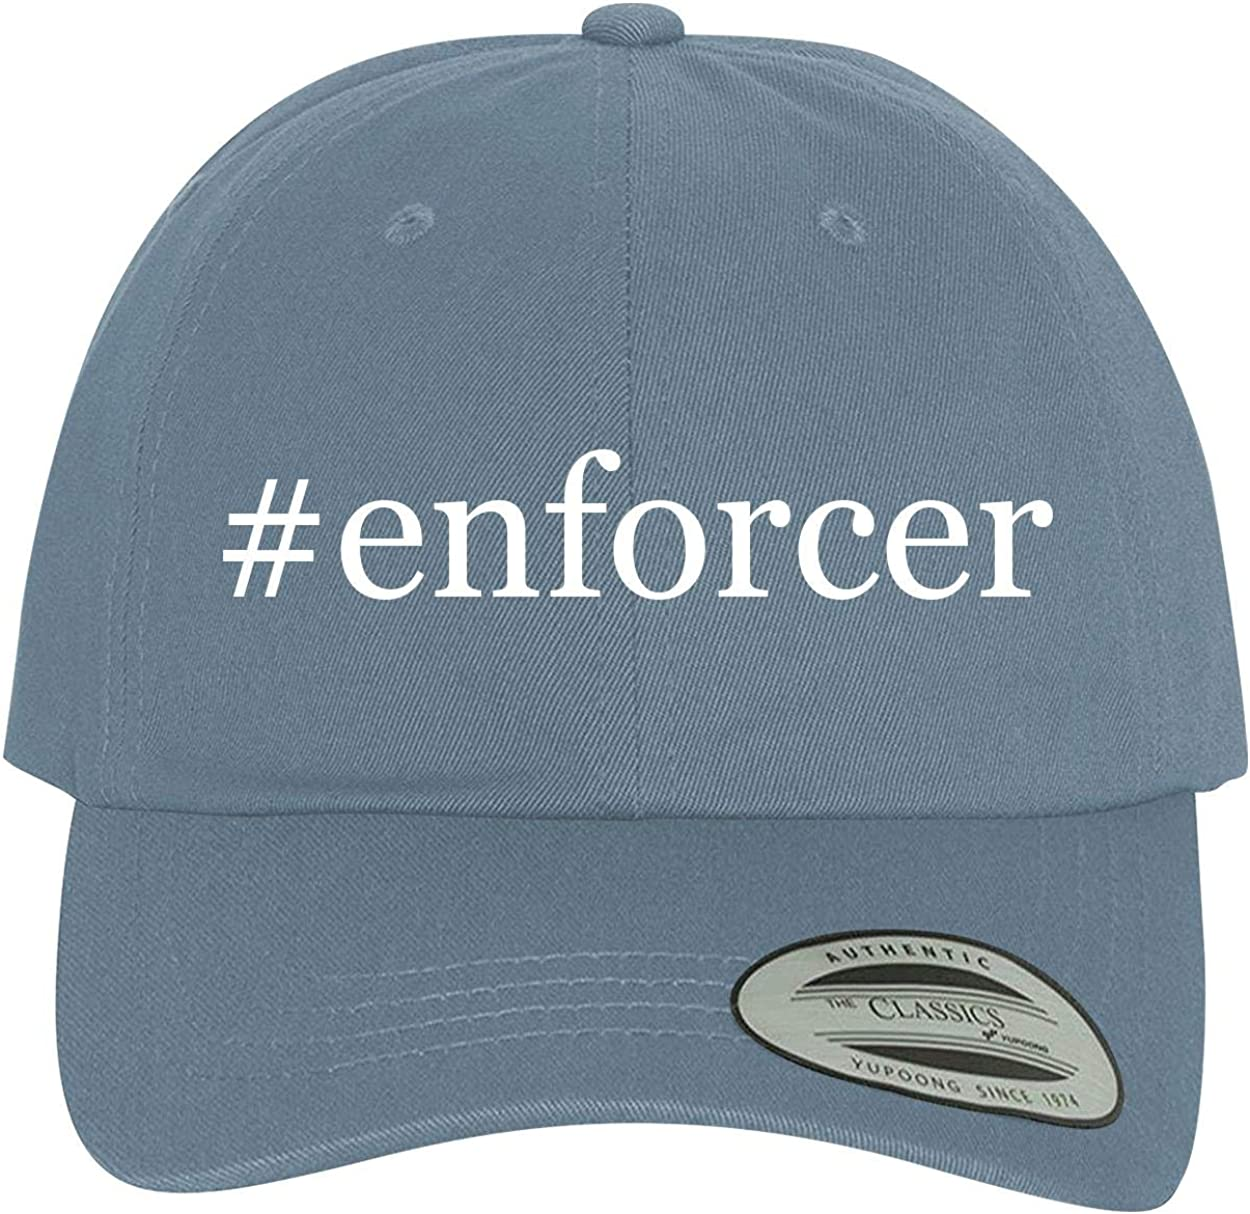 Comfortable Dad Hat Baseball Cap BH Cool Designs #Enforcer